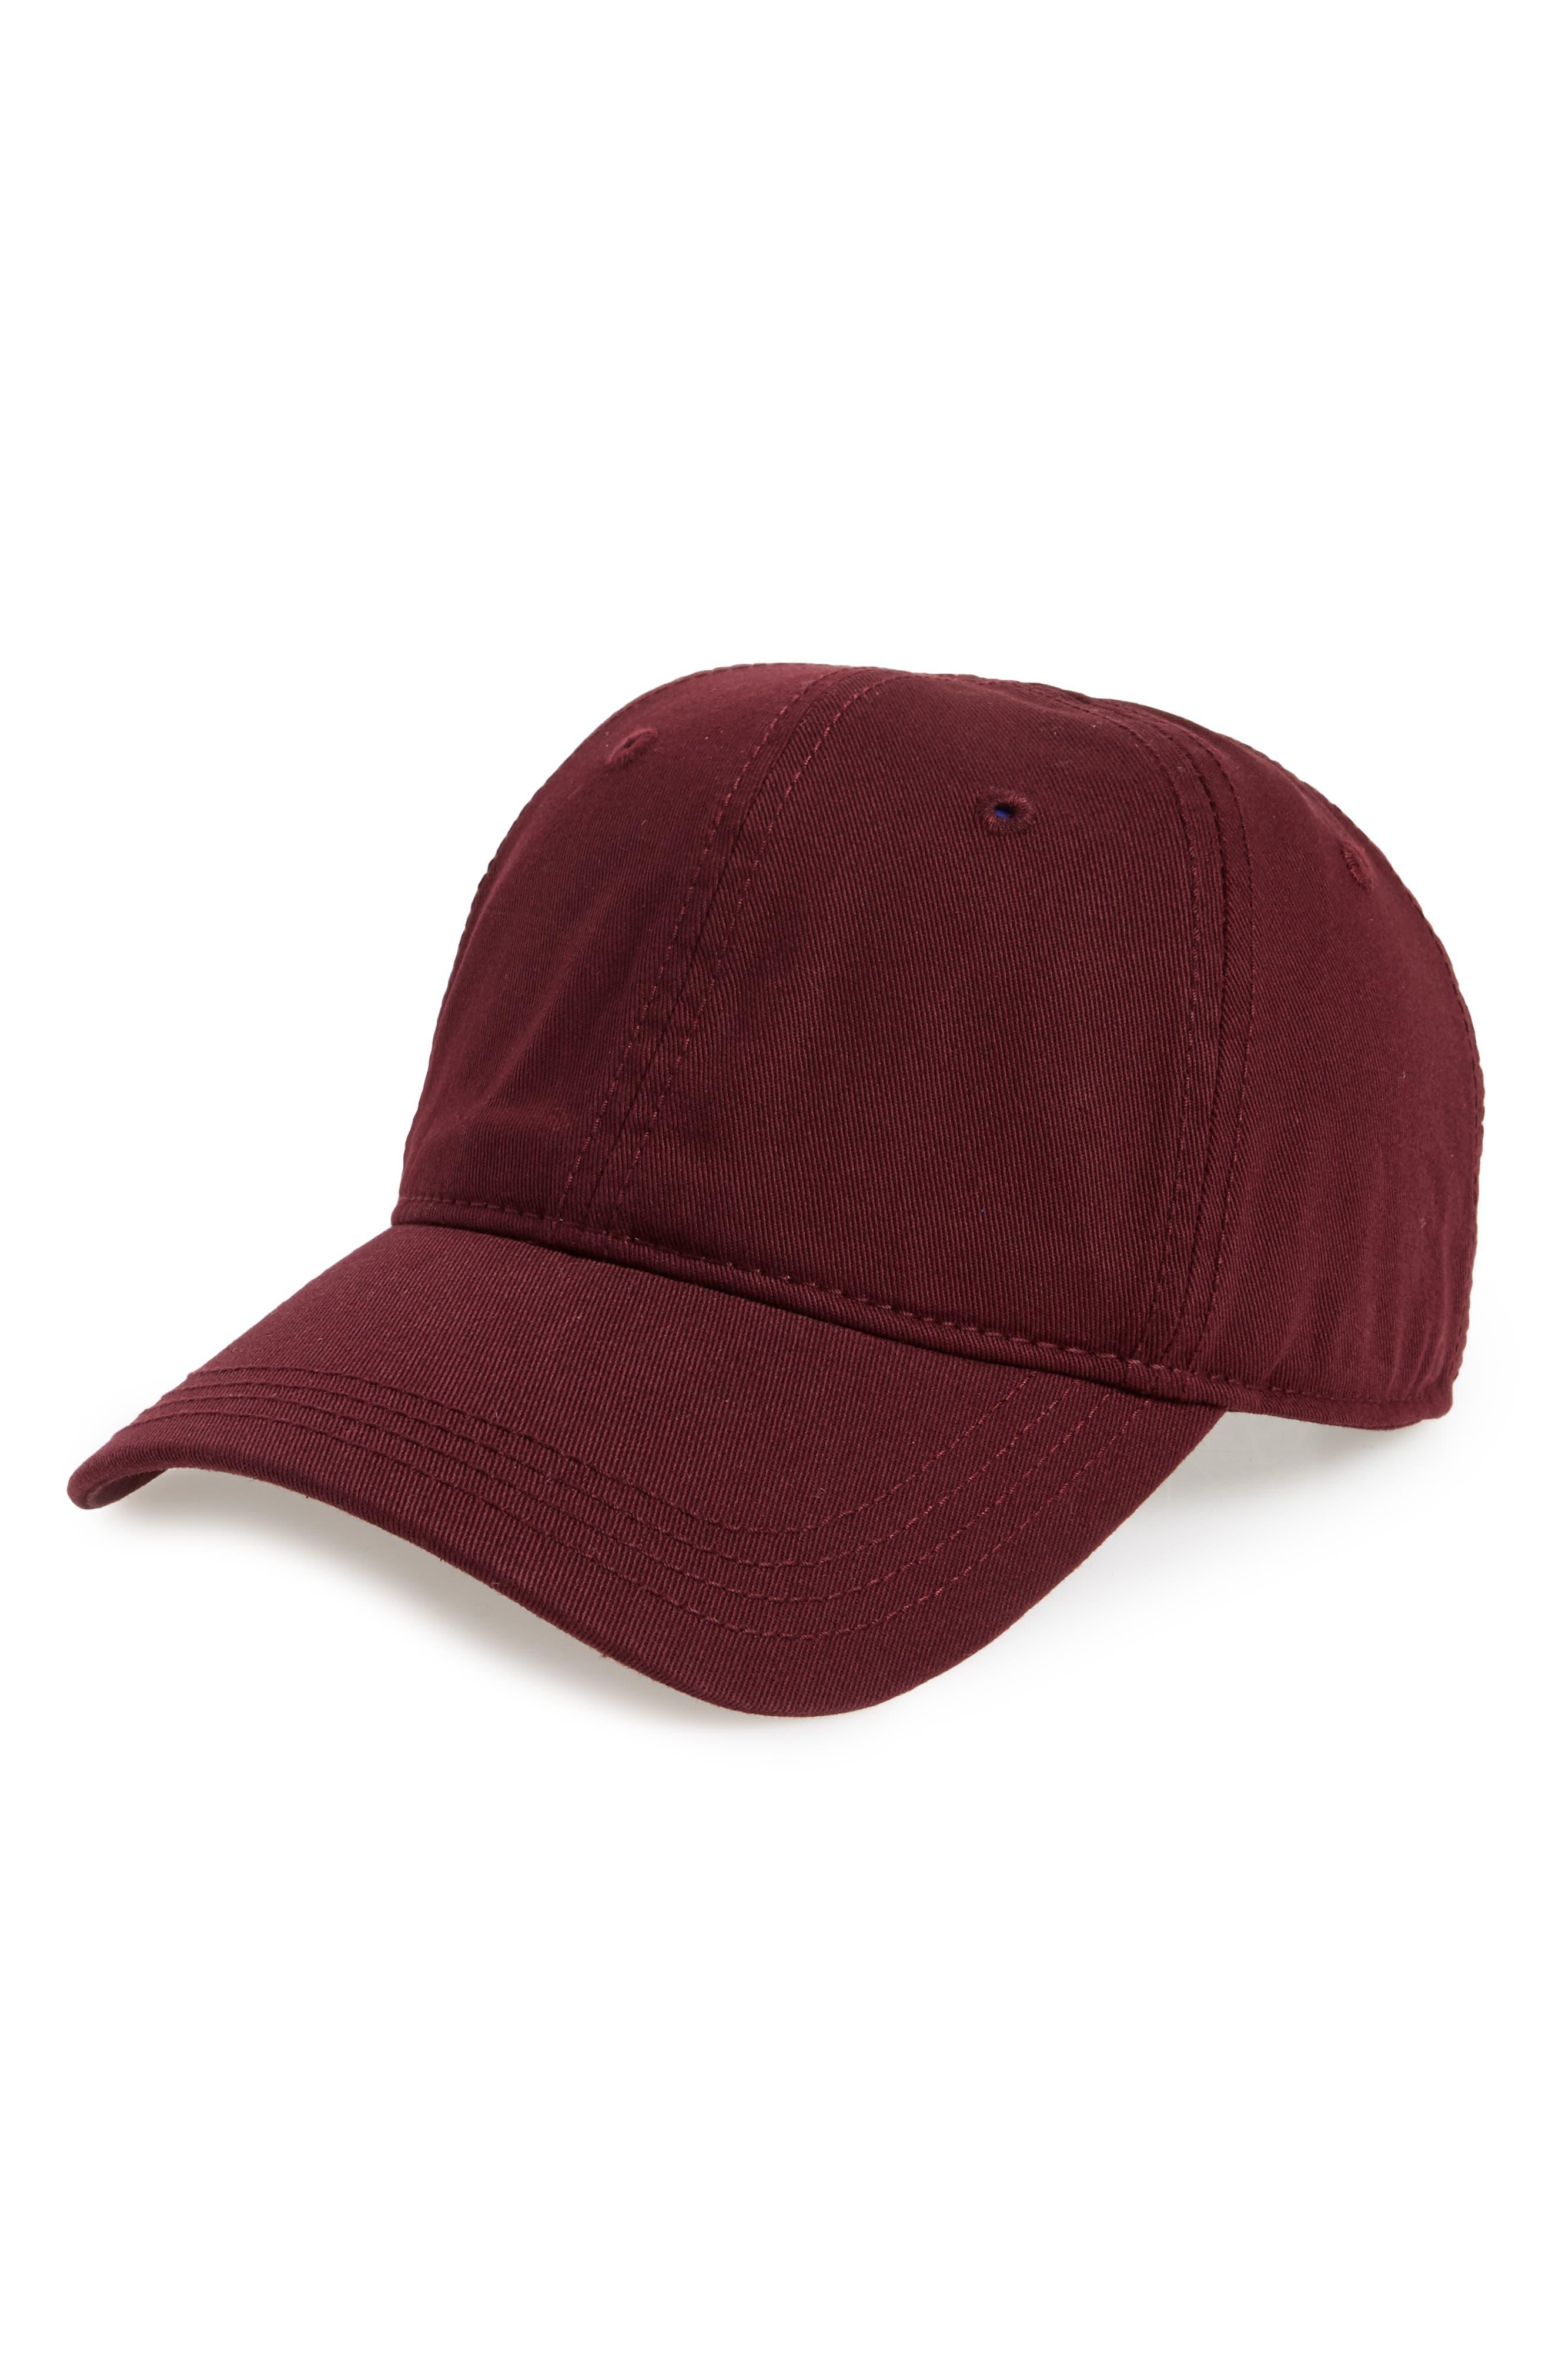 Alternate Image 1 Selected - Lacoste 'Classic' Cap